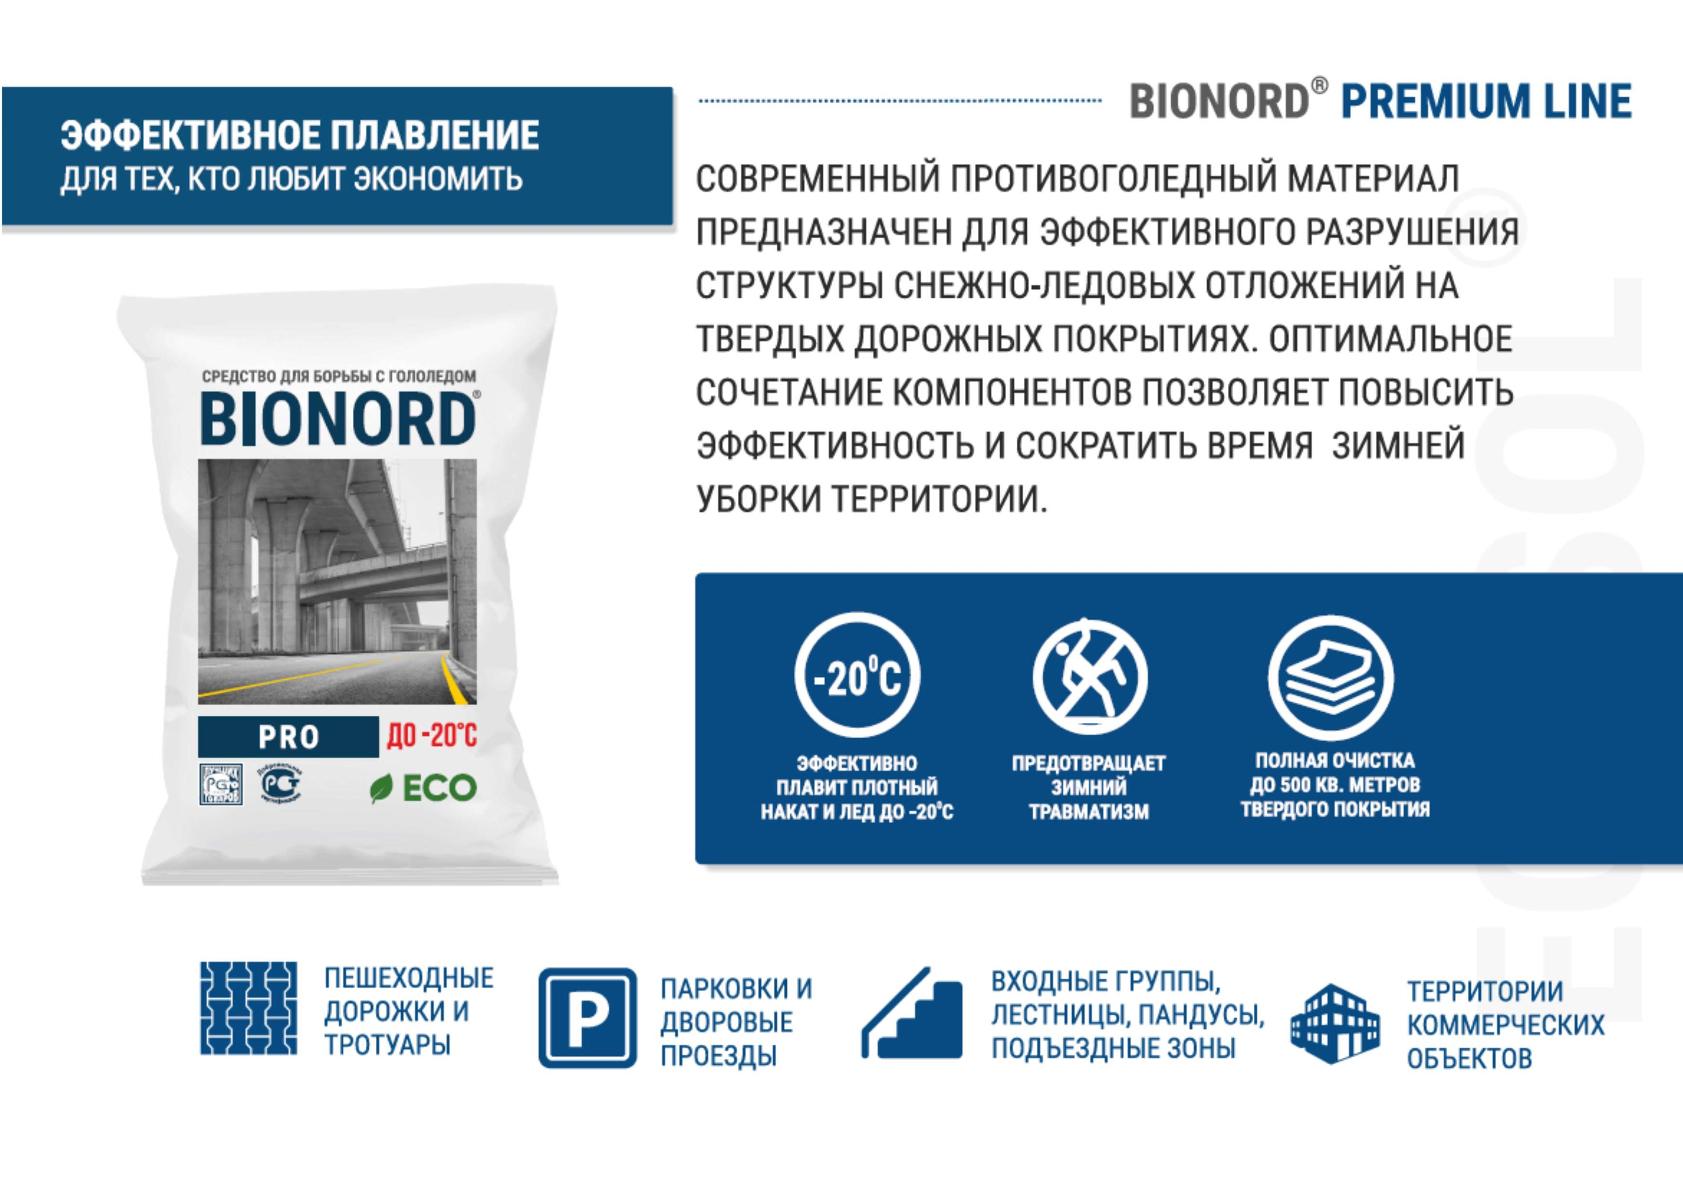 BIONORD PRO - BIONORD® Premium Line